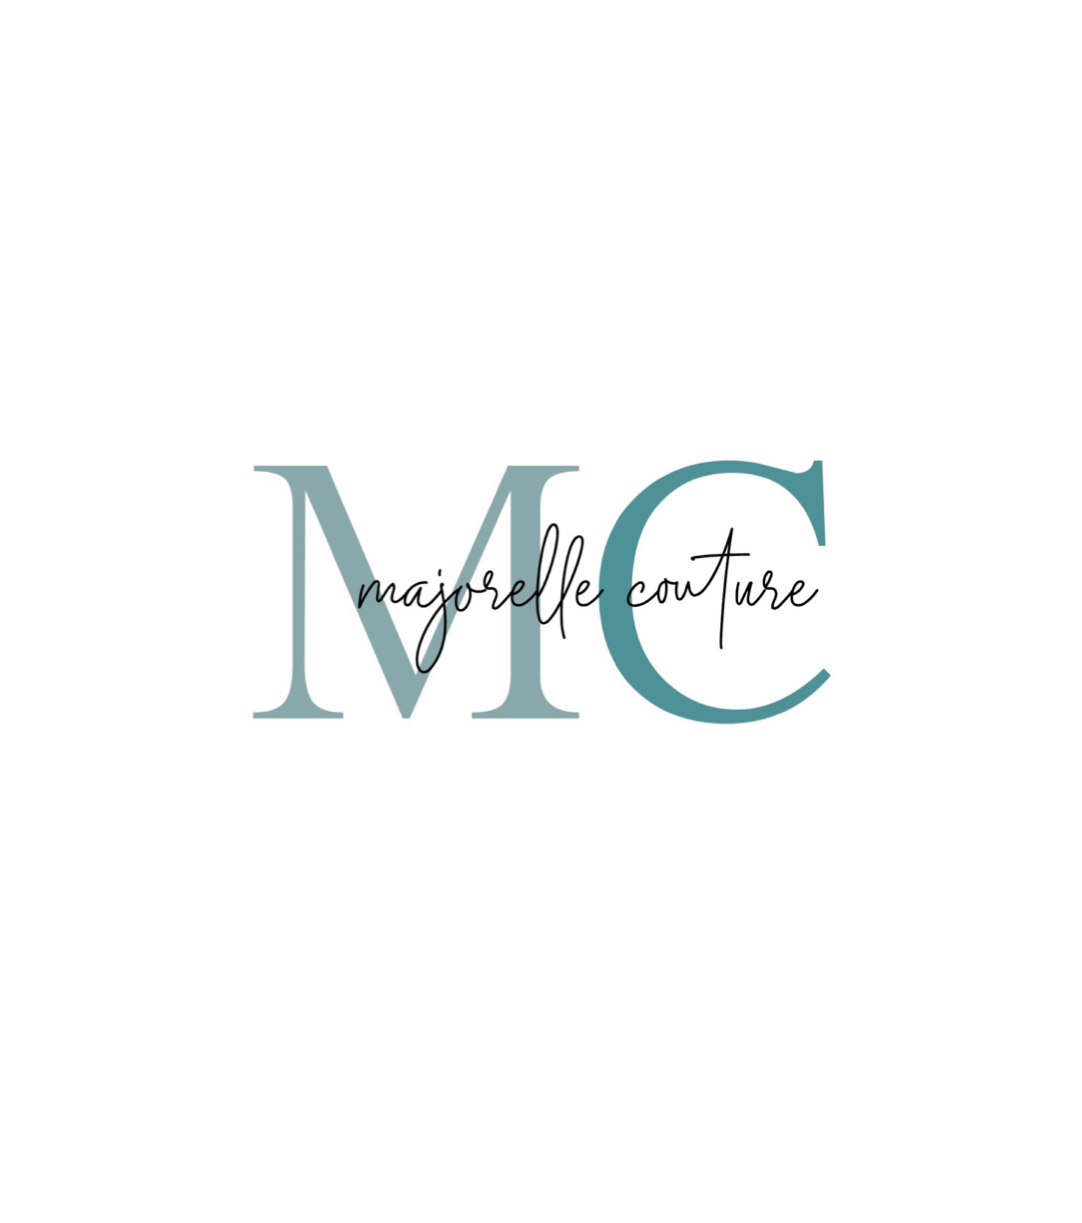 Majorelle Couture